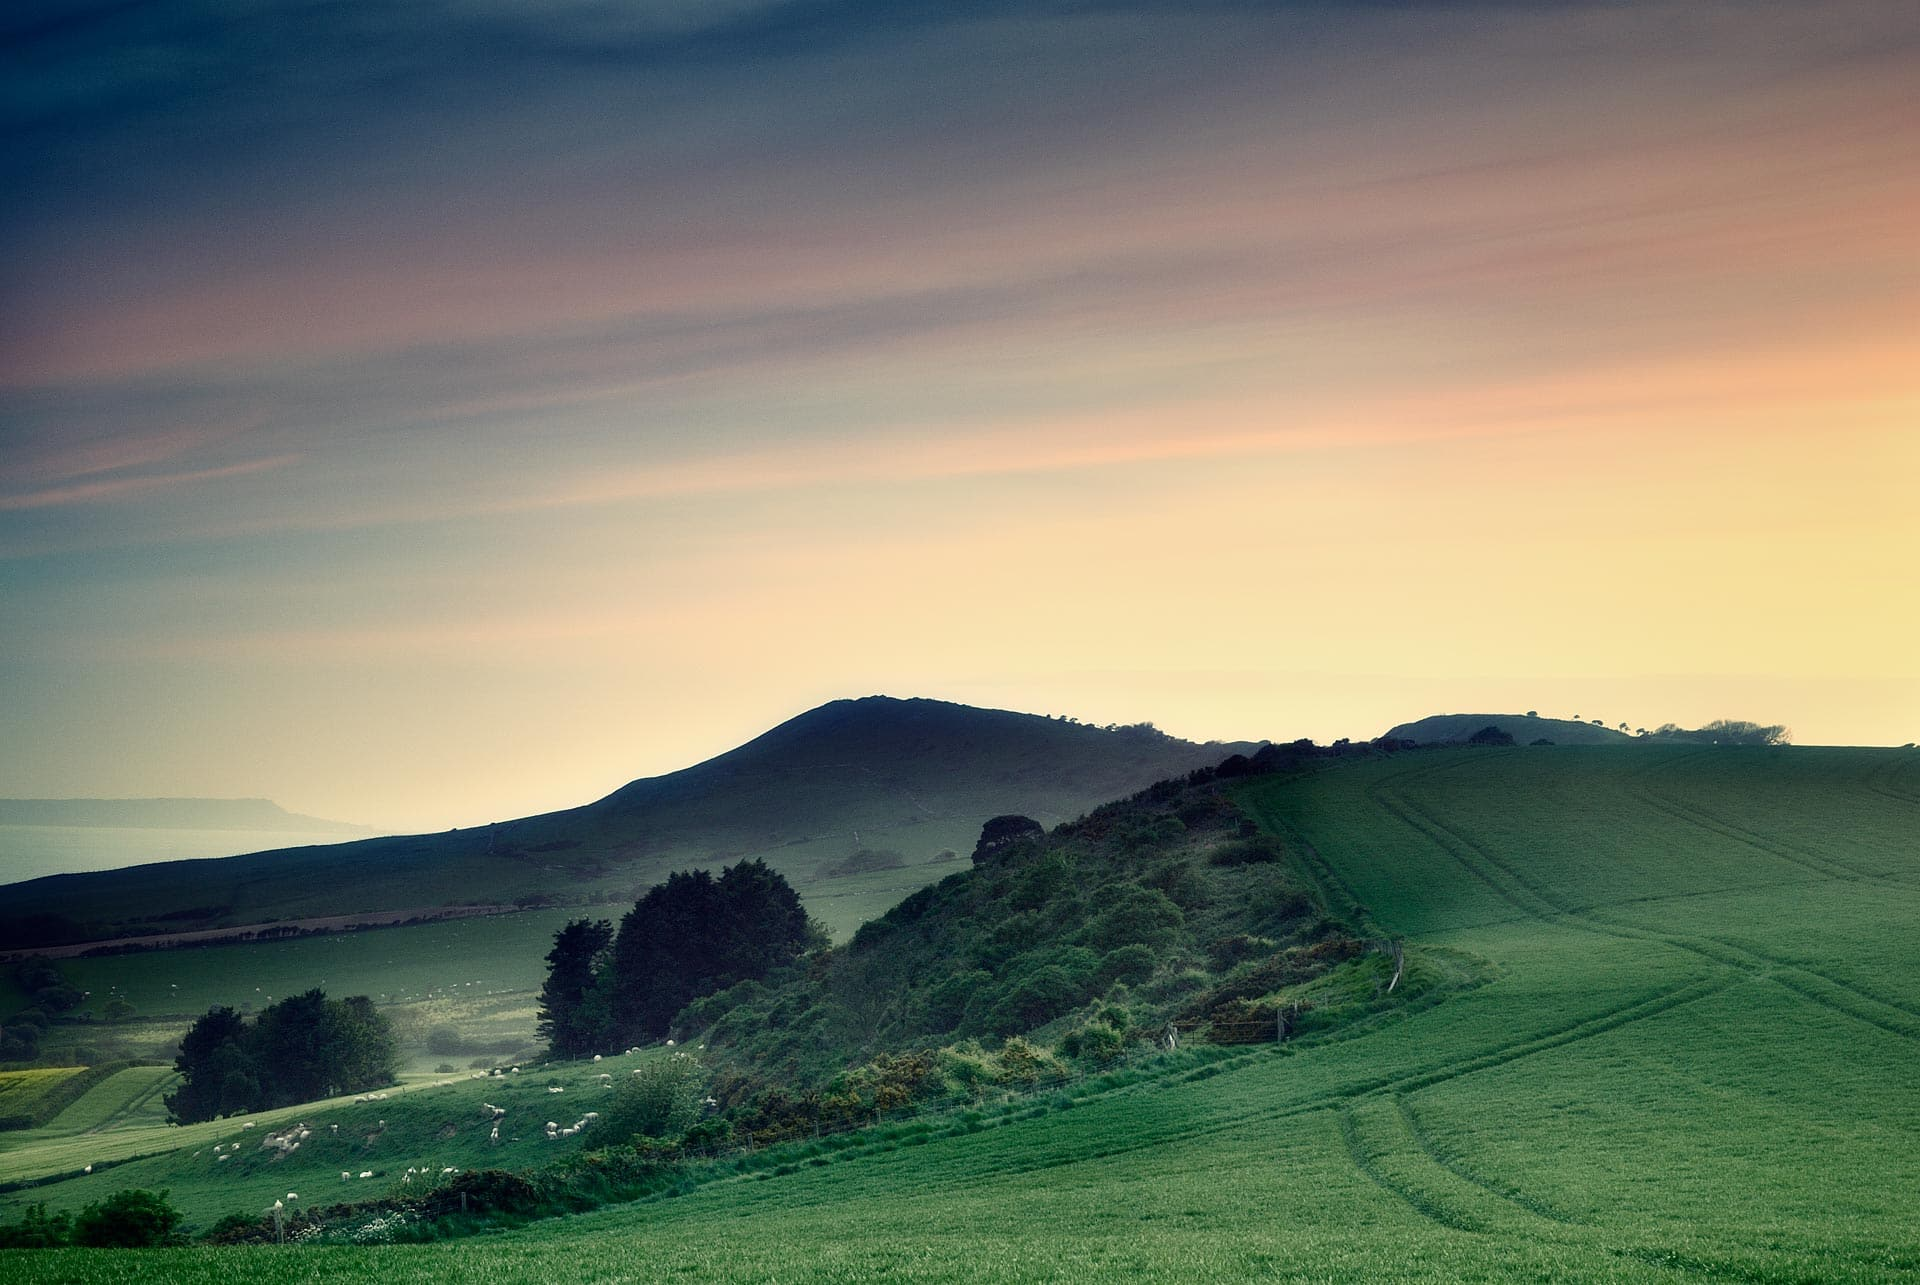 Isle of purbeck, dorset,england,uk